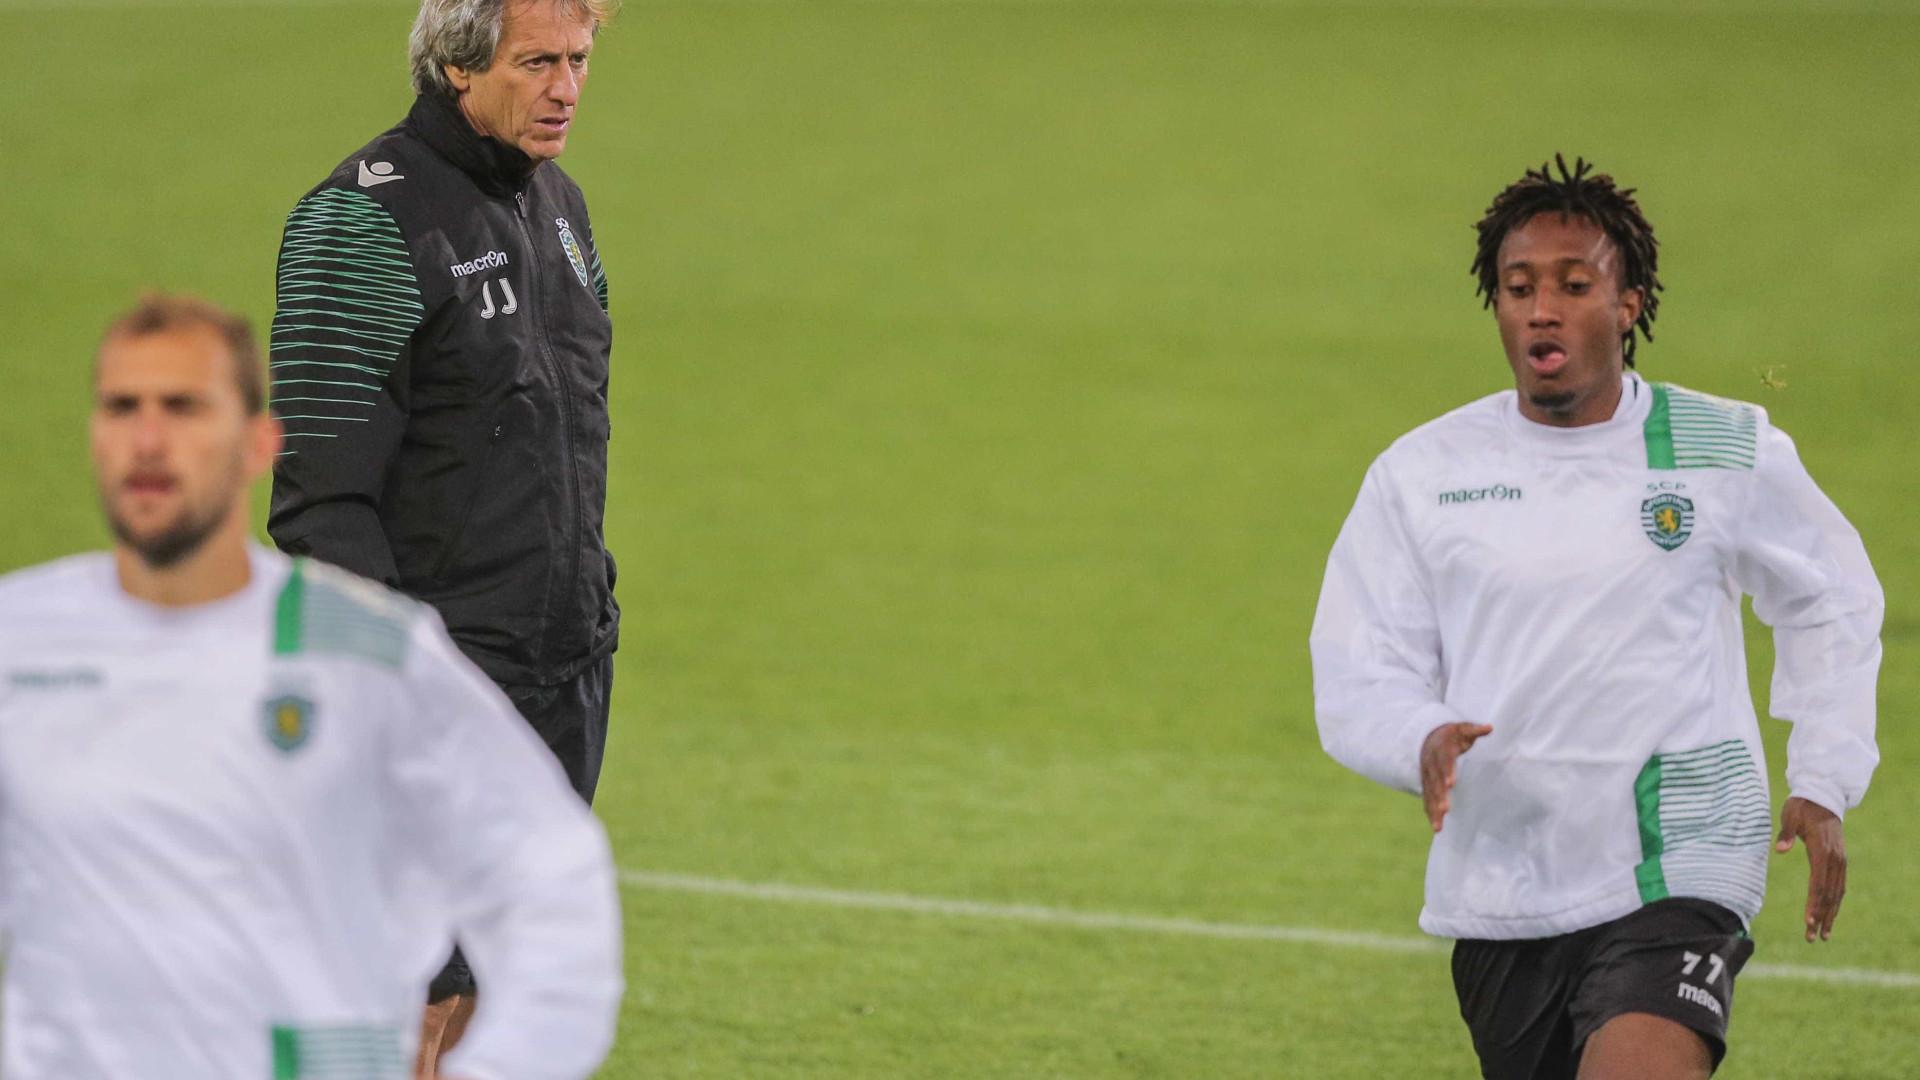 Sporting: Jesus leva 29 para a Suíça, incluindo Jovane Cabral